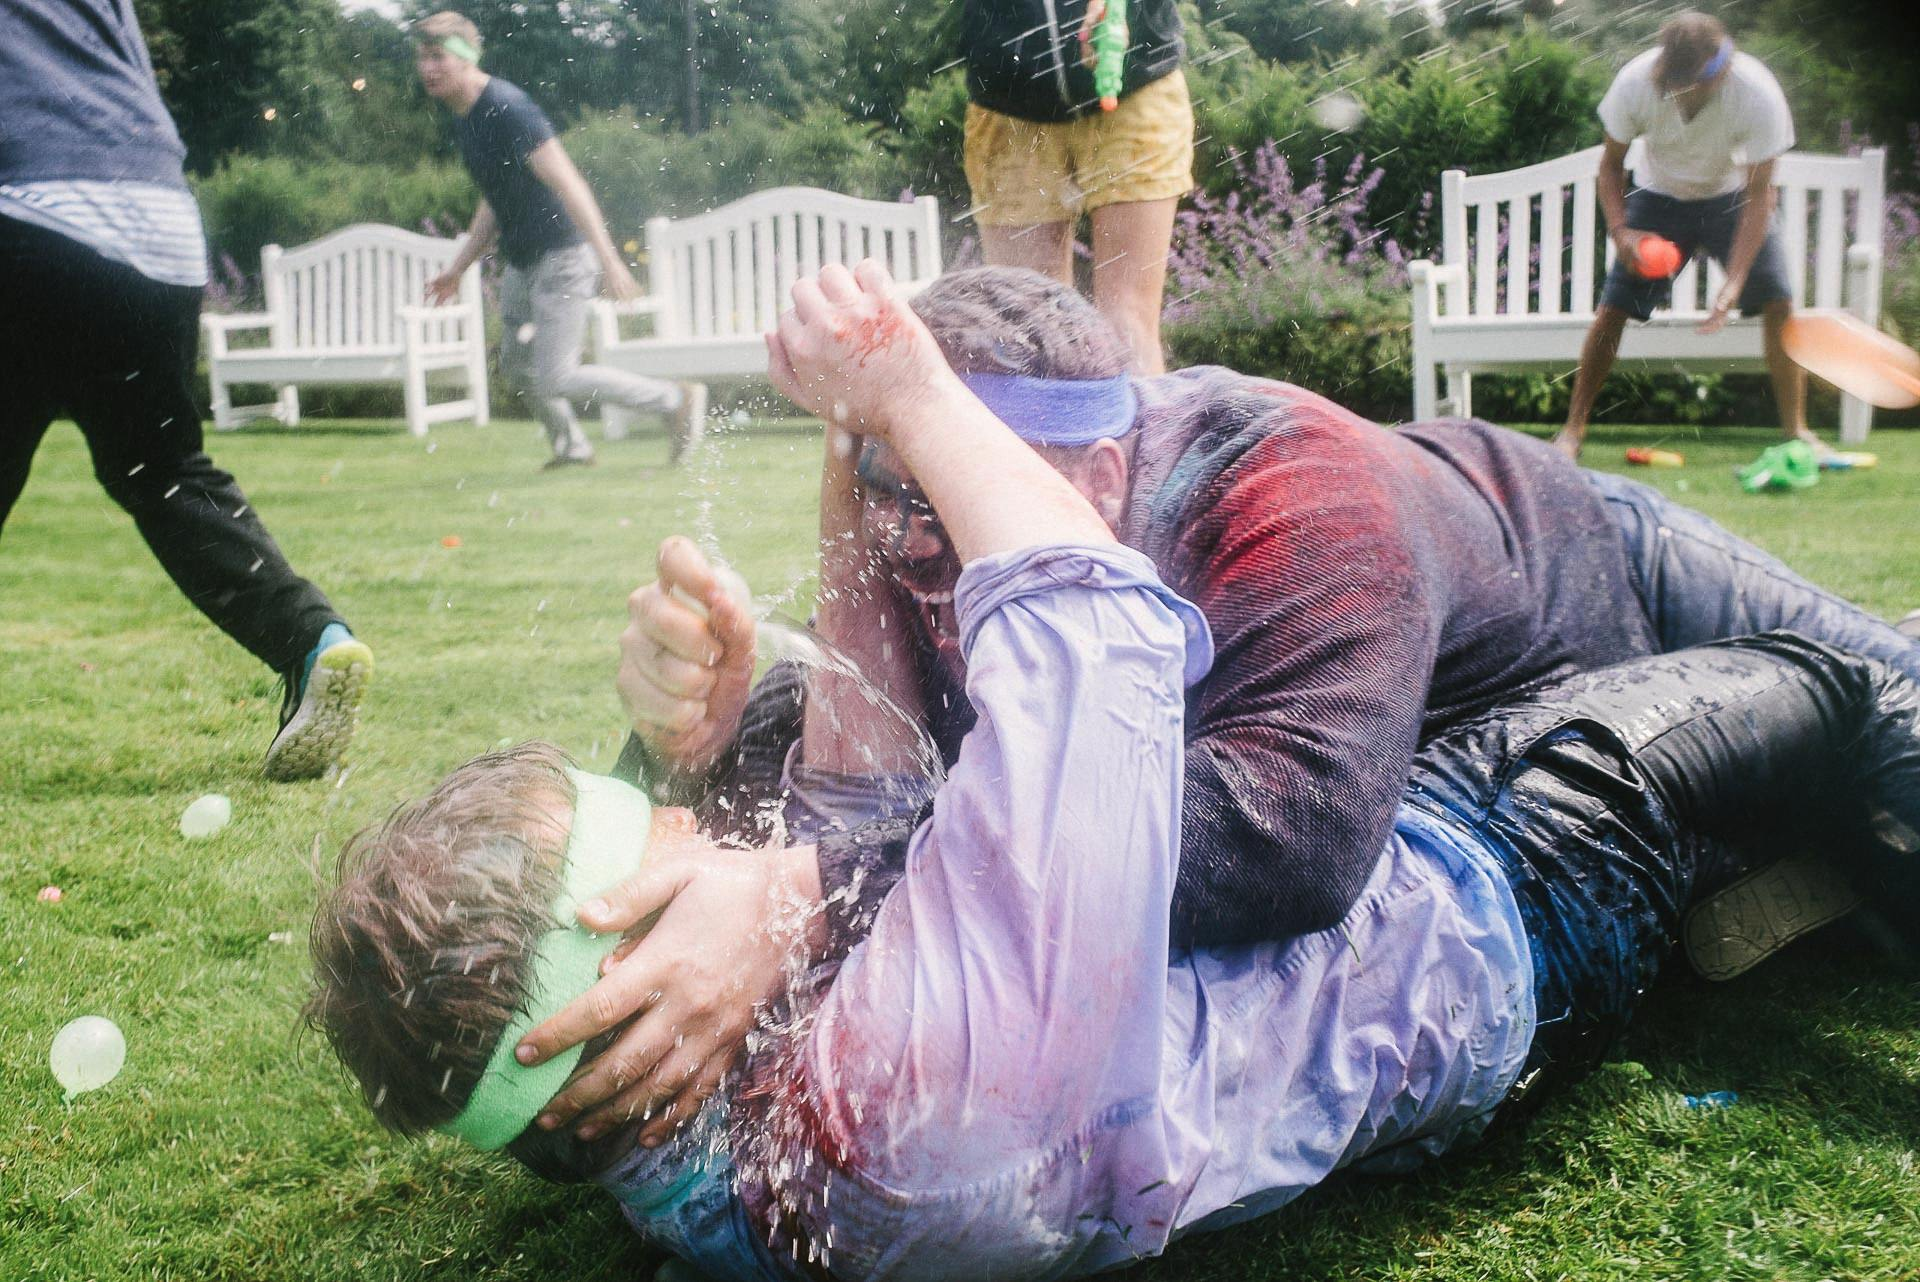 wedding water fight